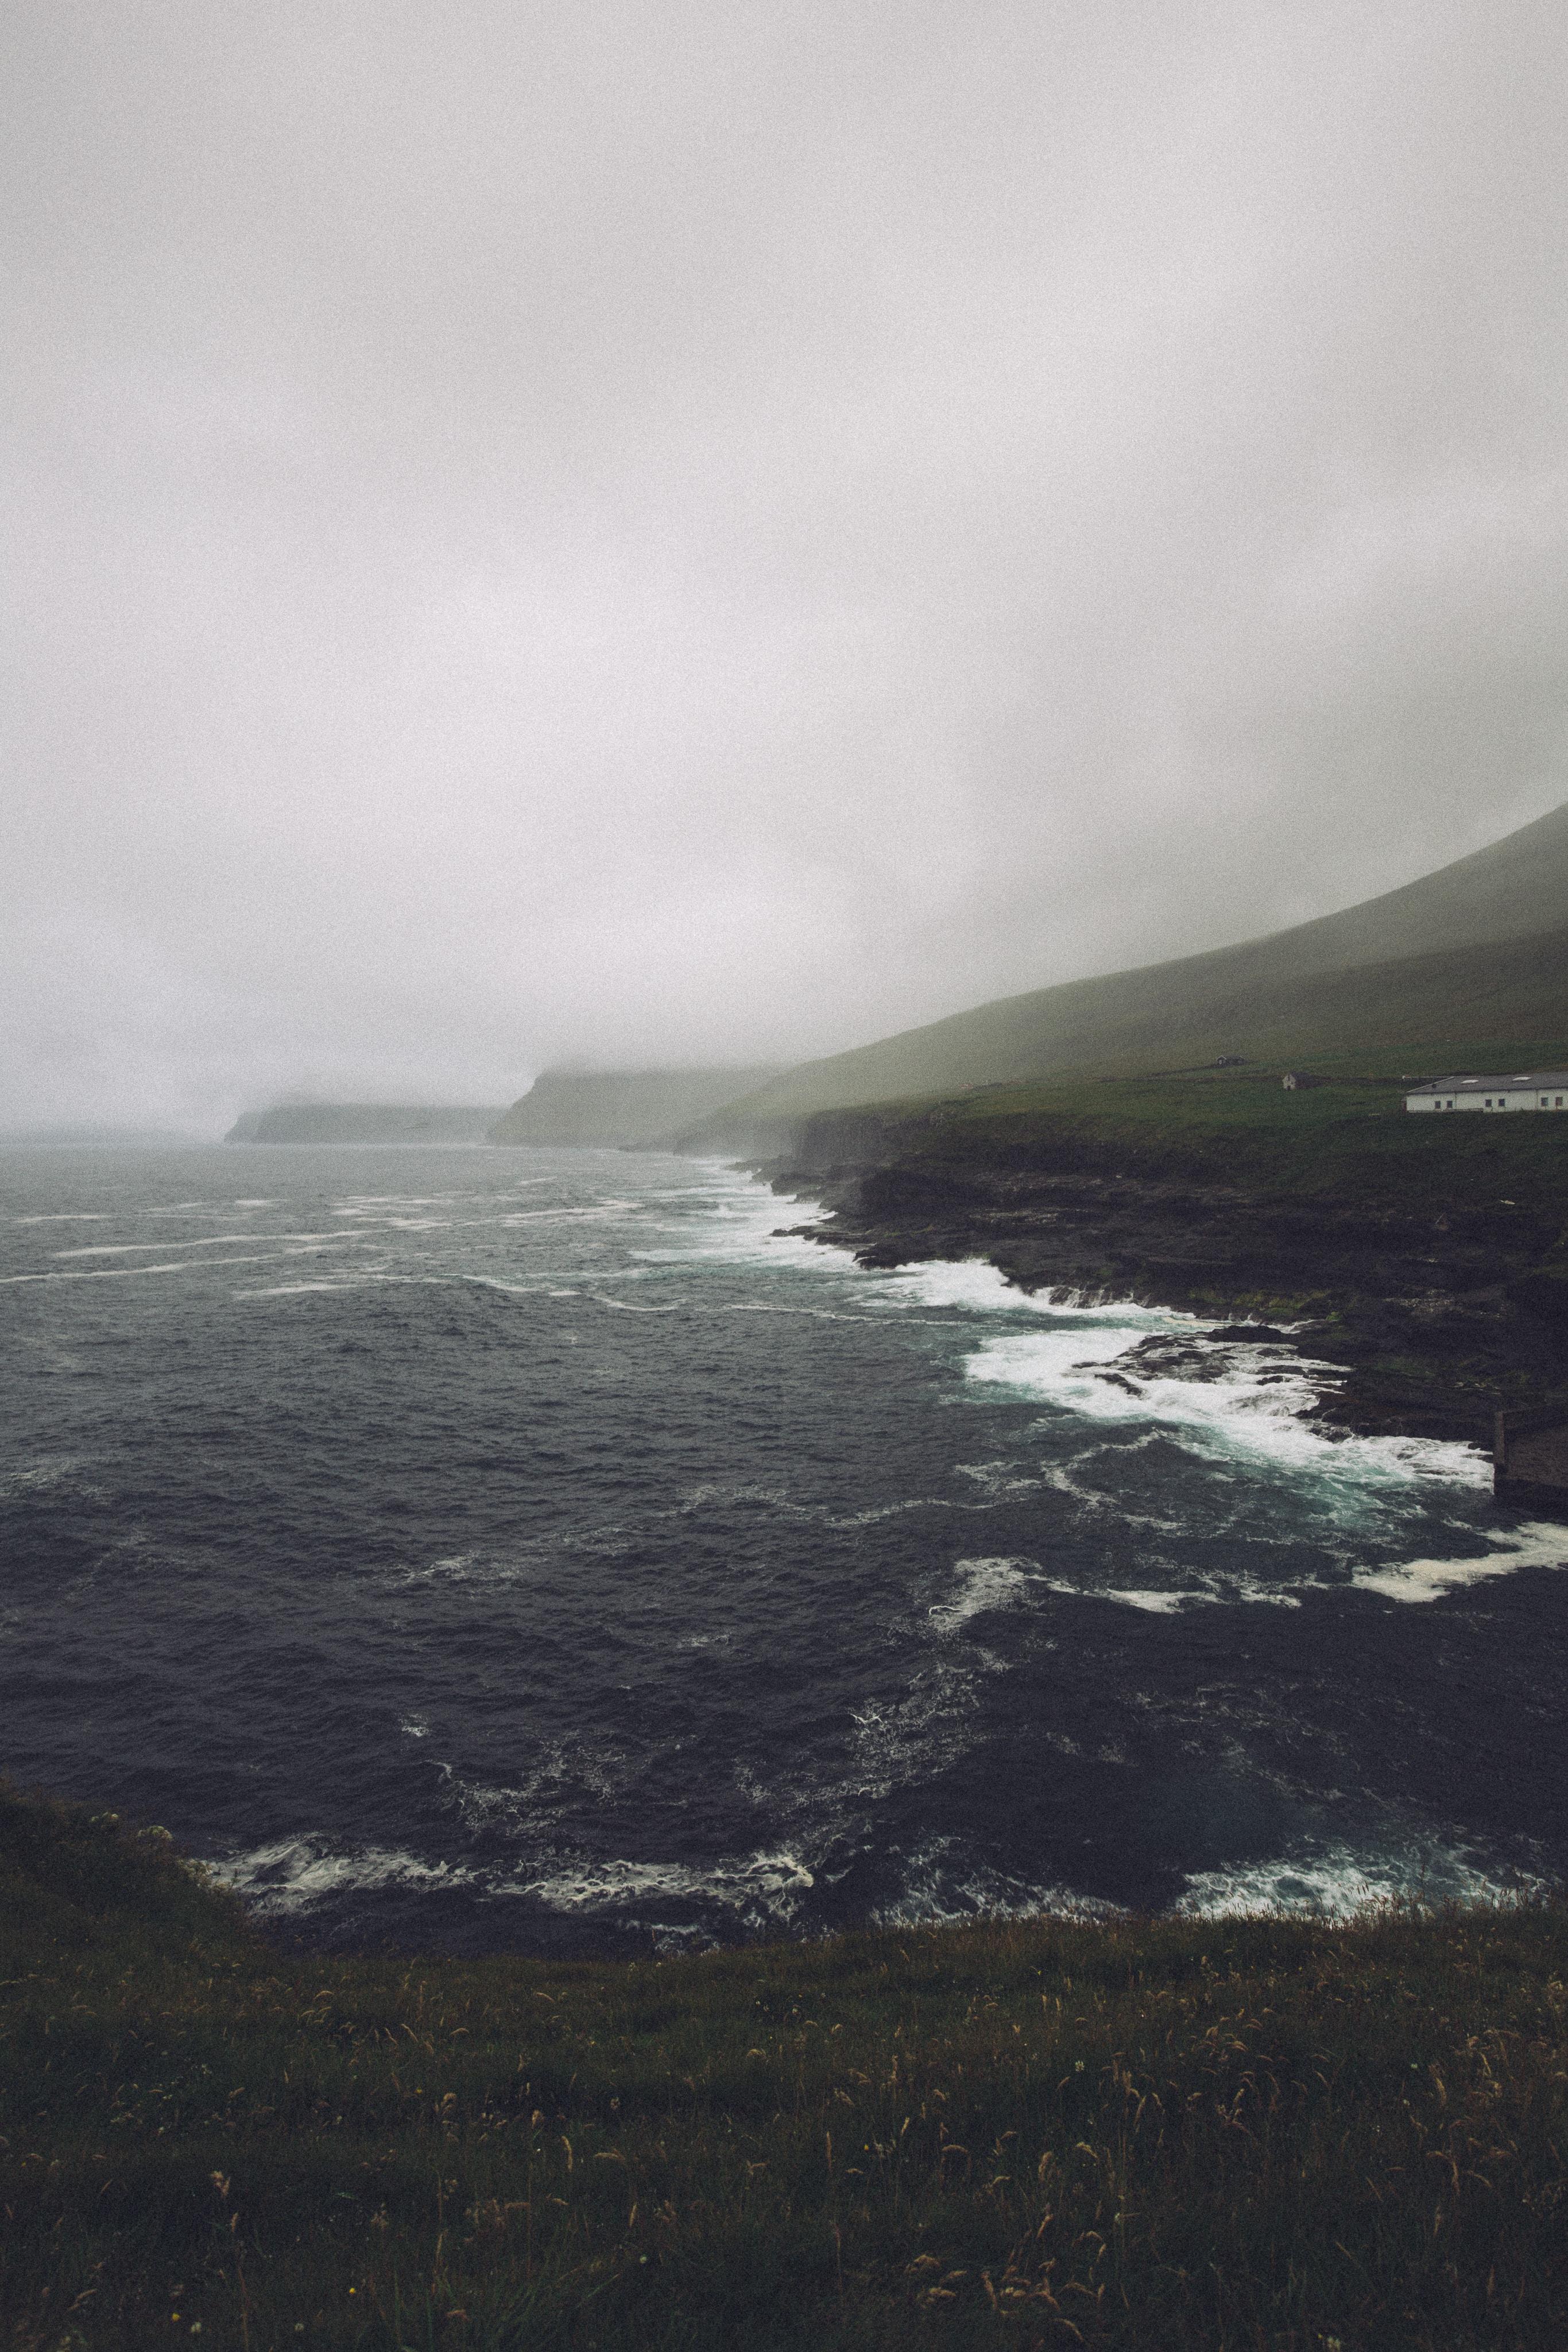 ocean near mountain